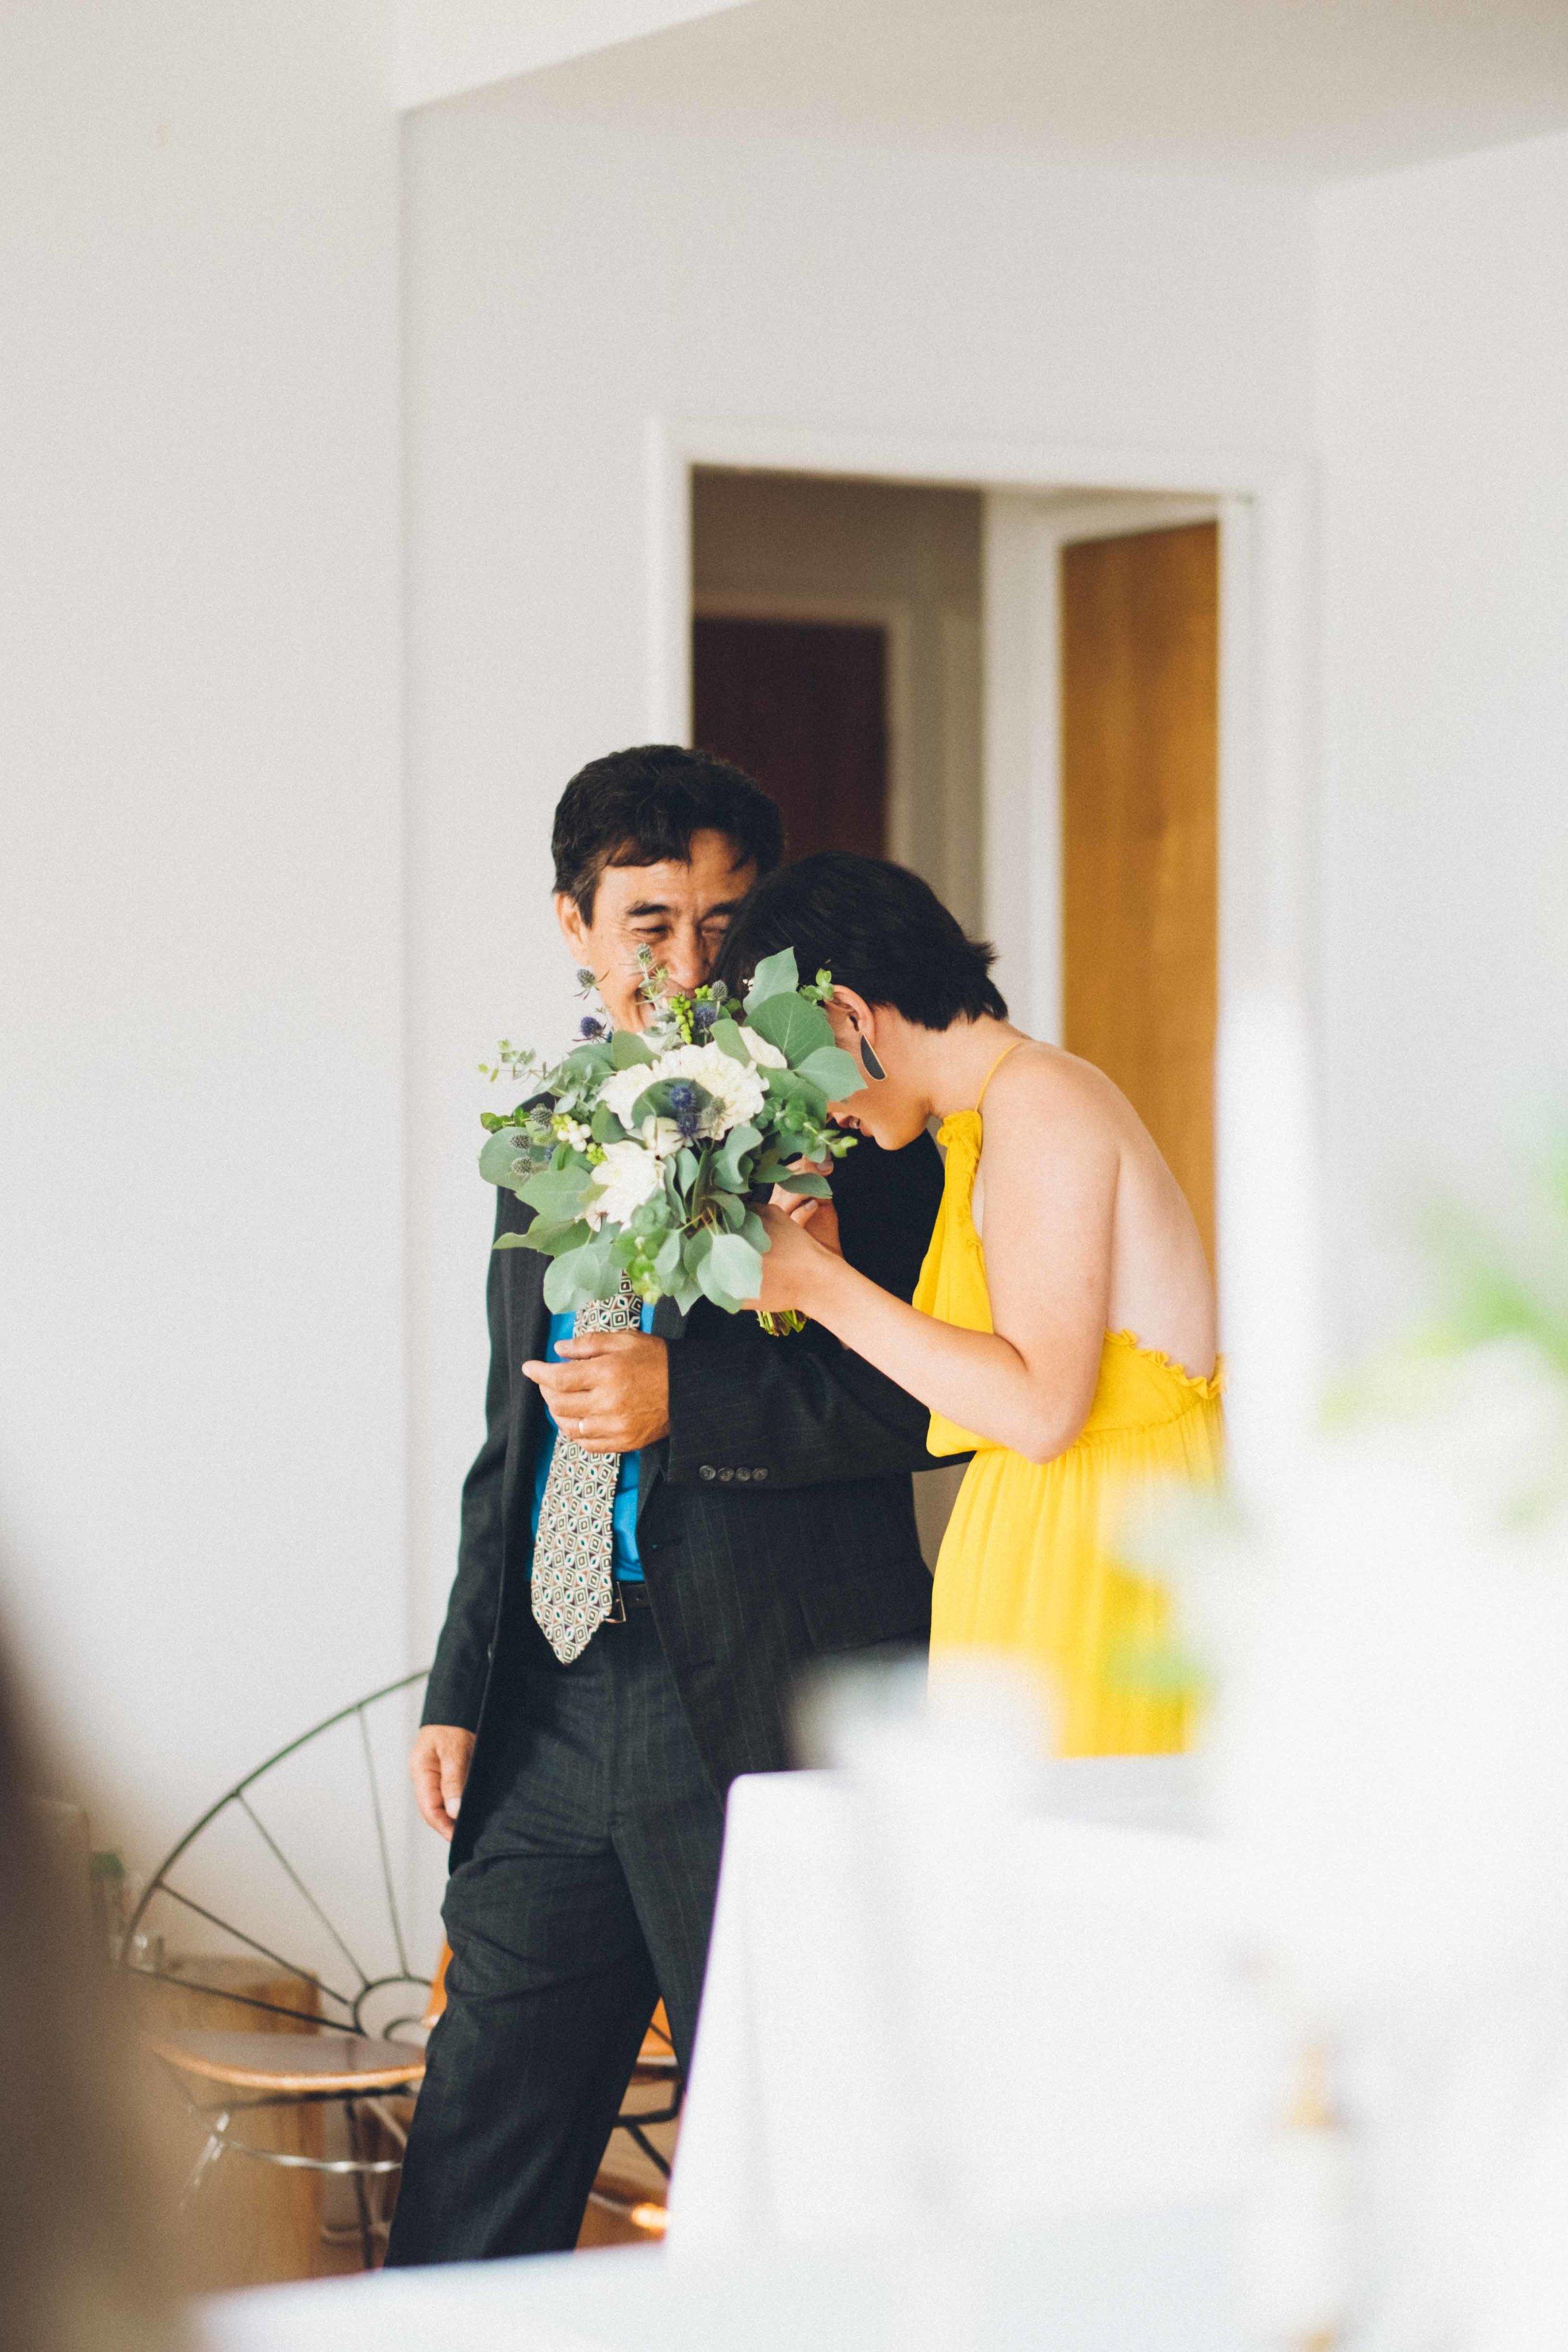 c-l-wedding-russell-rabanal-6543.jpg